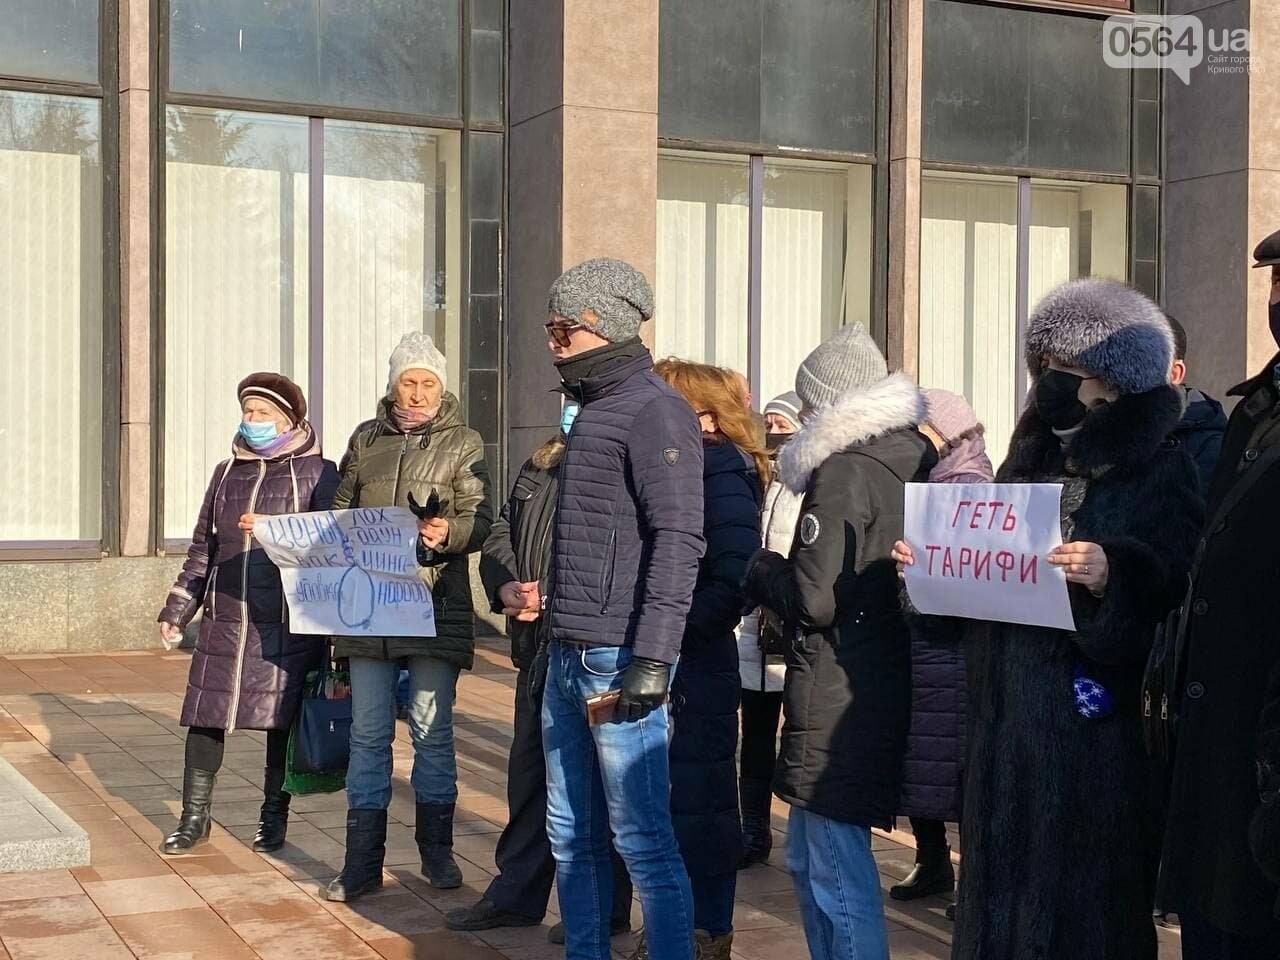 "Криворожане вышли на митинг против ""тарифного геноцида"", - ФОТО, ВИДЕО (ДОПОЛНЕНО), фото-26"